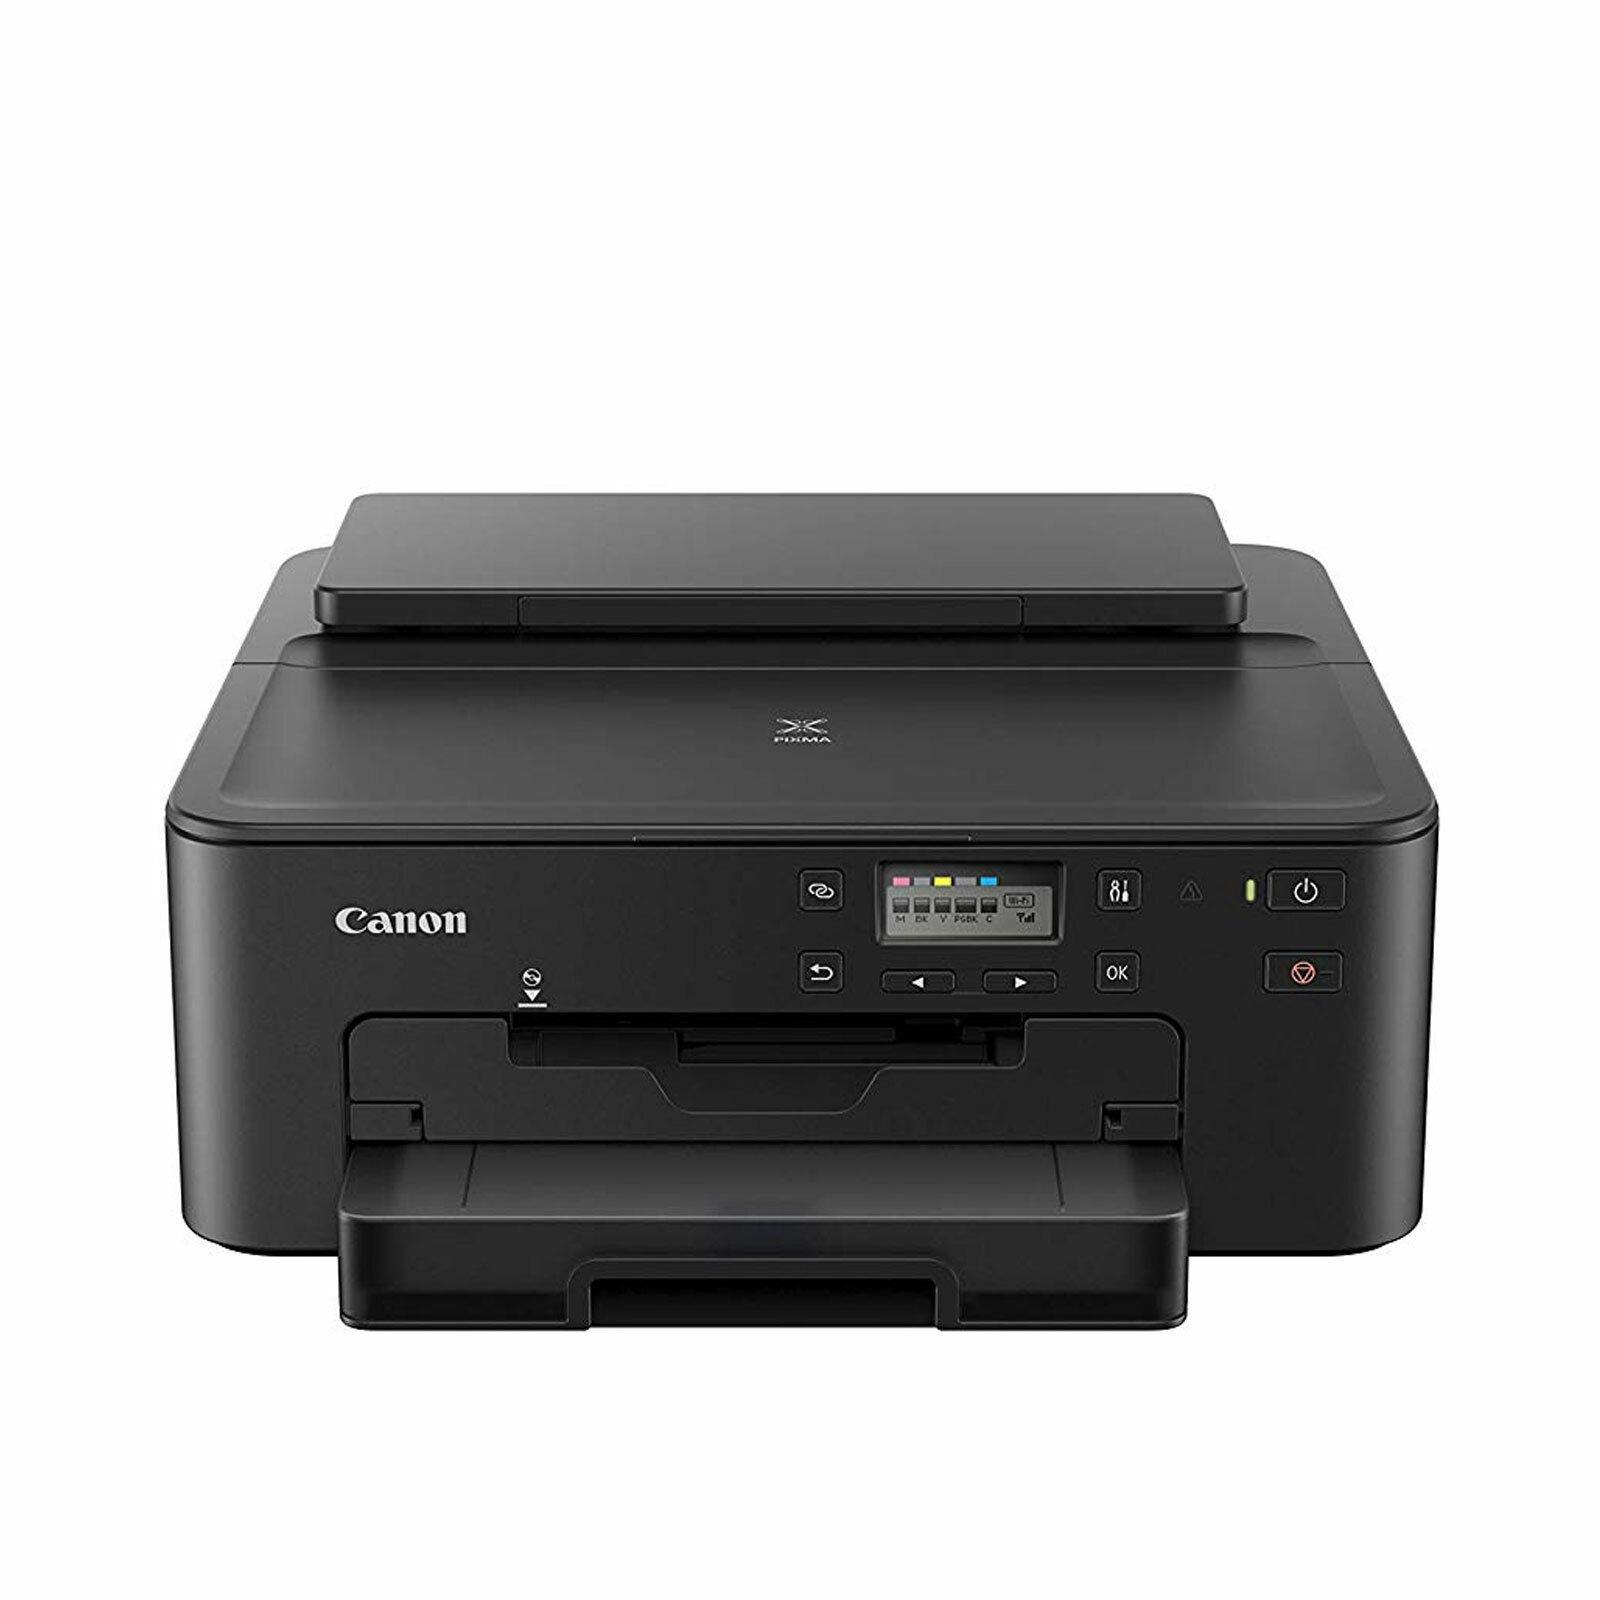 Canon Pixma TS 705 schwarz Tintenstrahldrucker WLAN Bluetooth